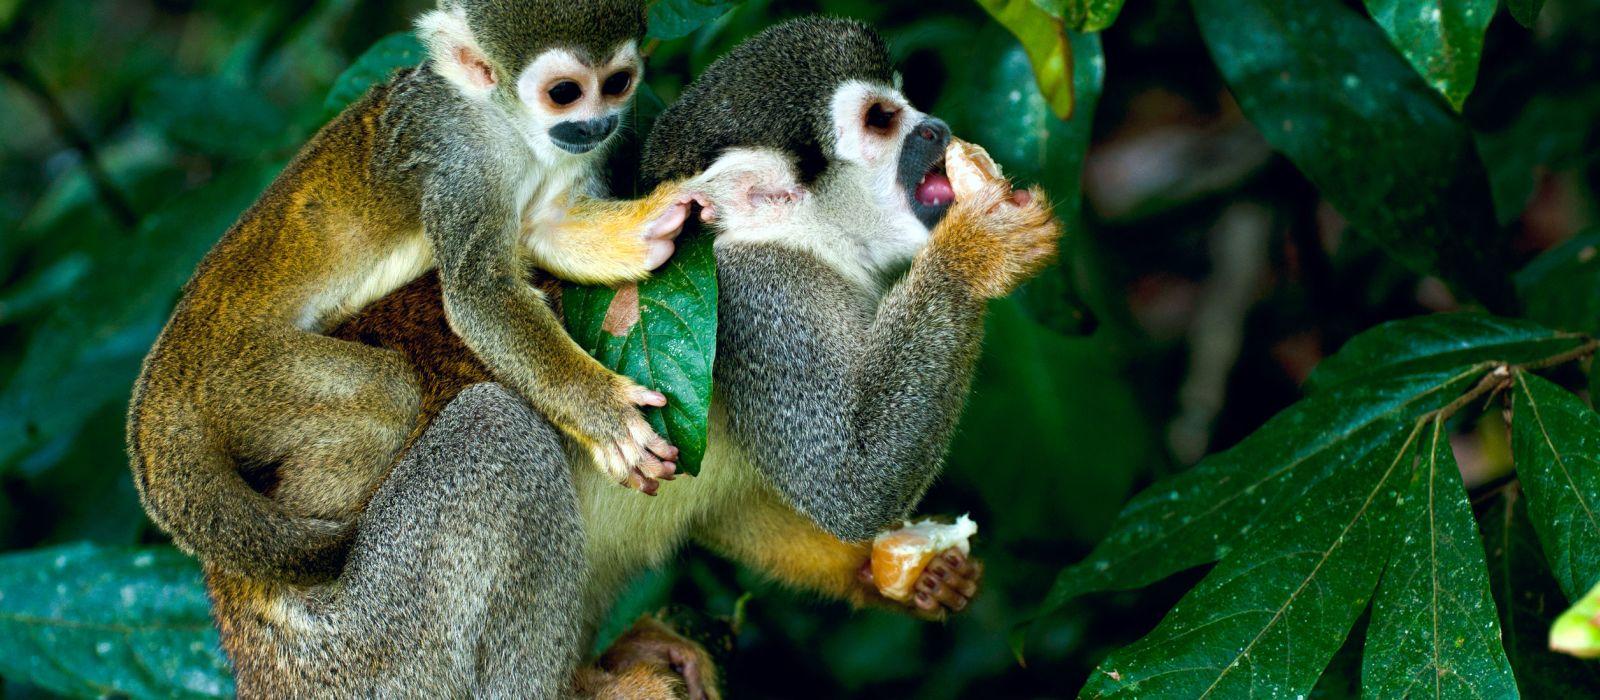 Brasilien Naturreise: Wasserfälle, Pantanal und Amazonas Urlaub 3